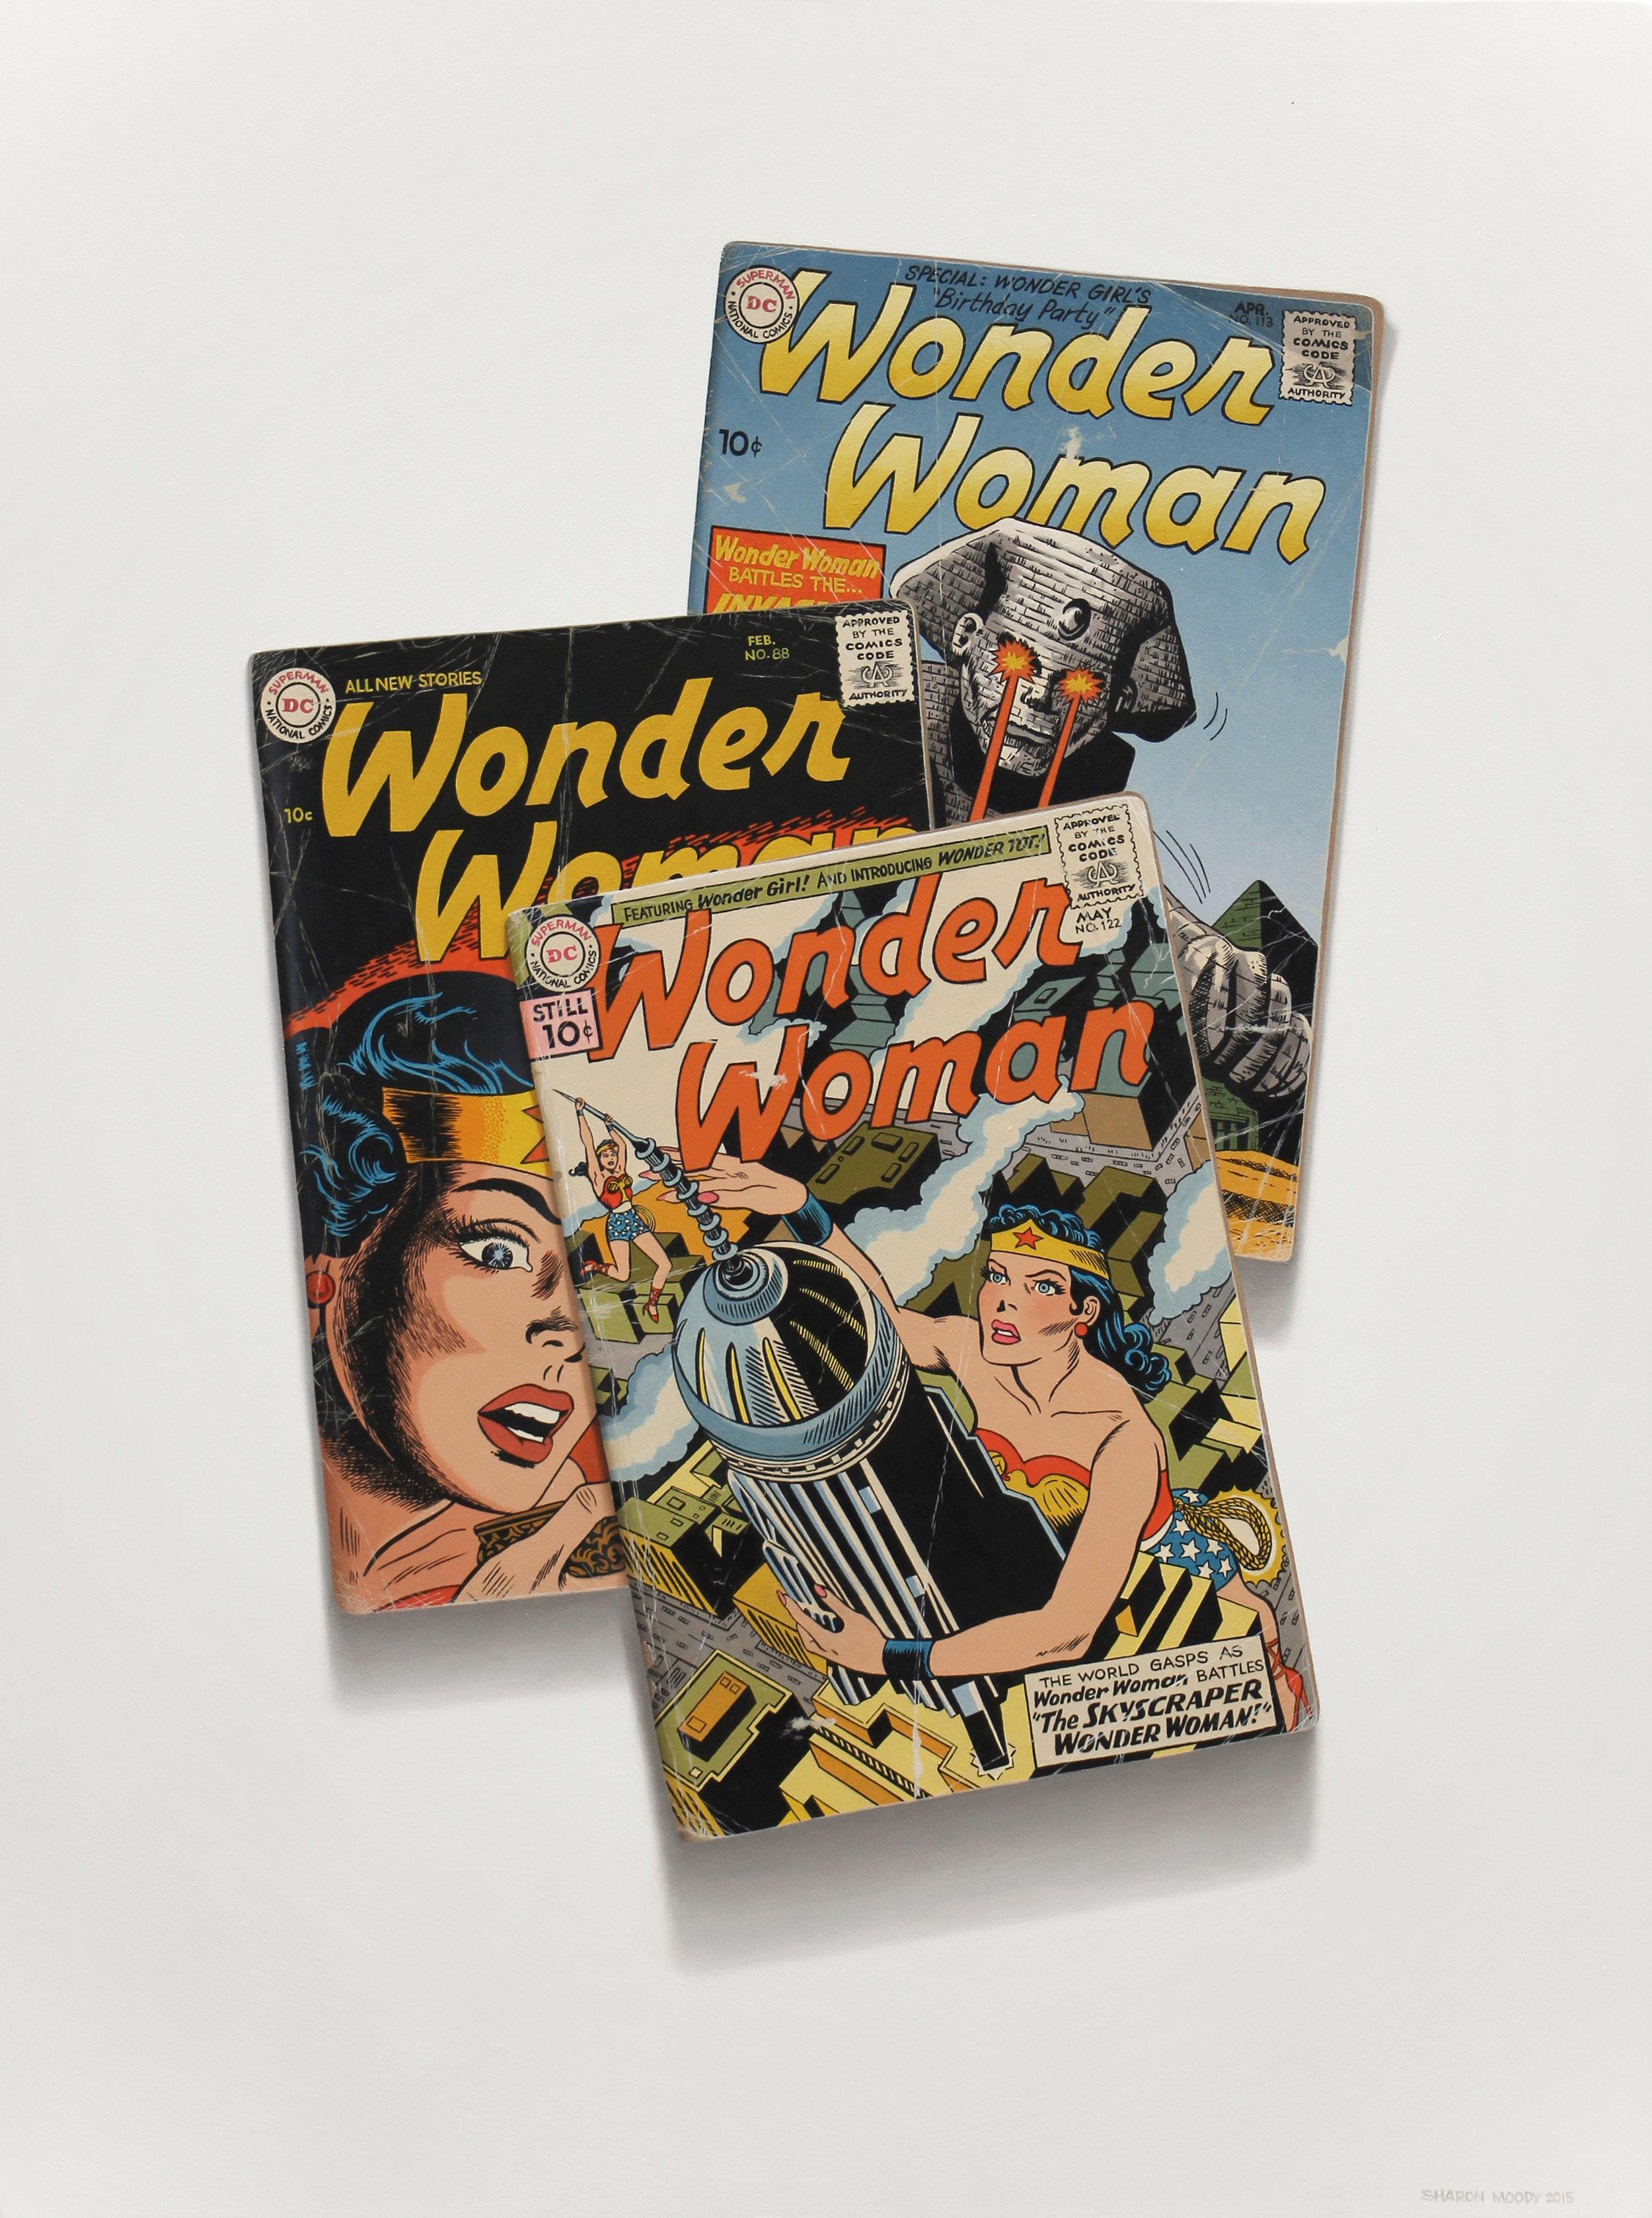 """The Skyscraper Wonder Woman"""